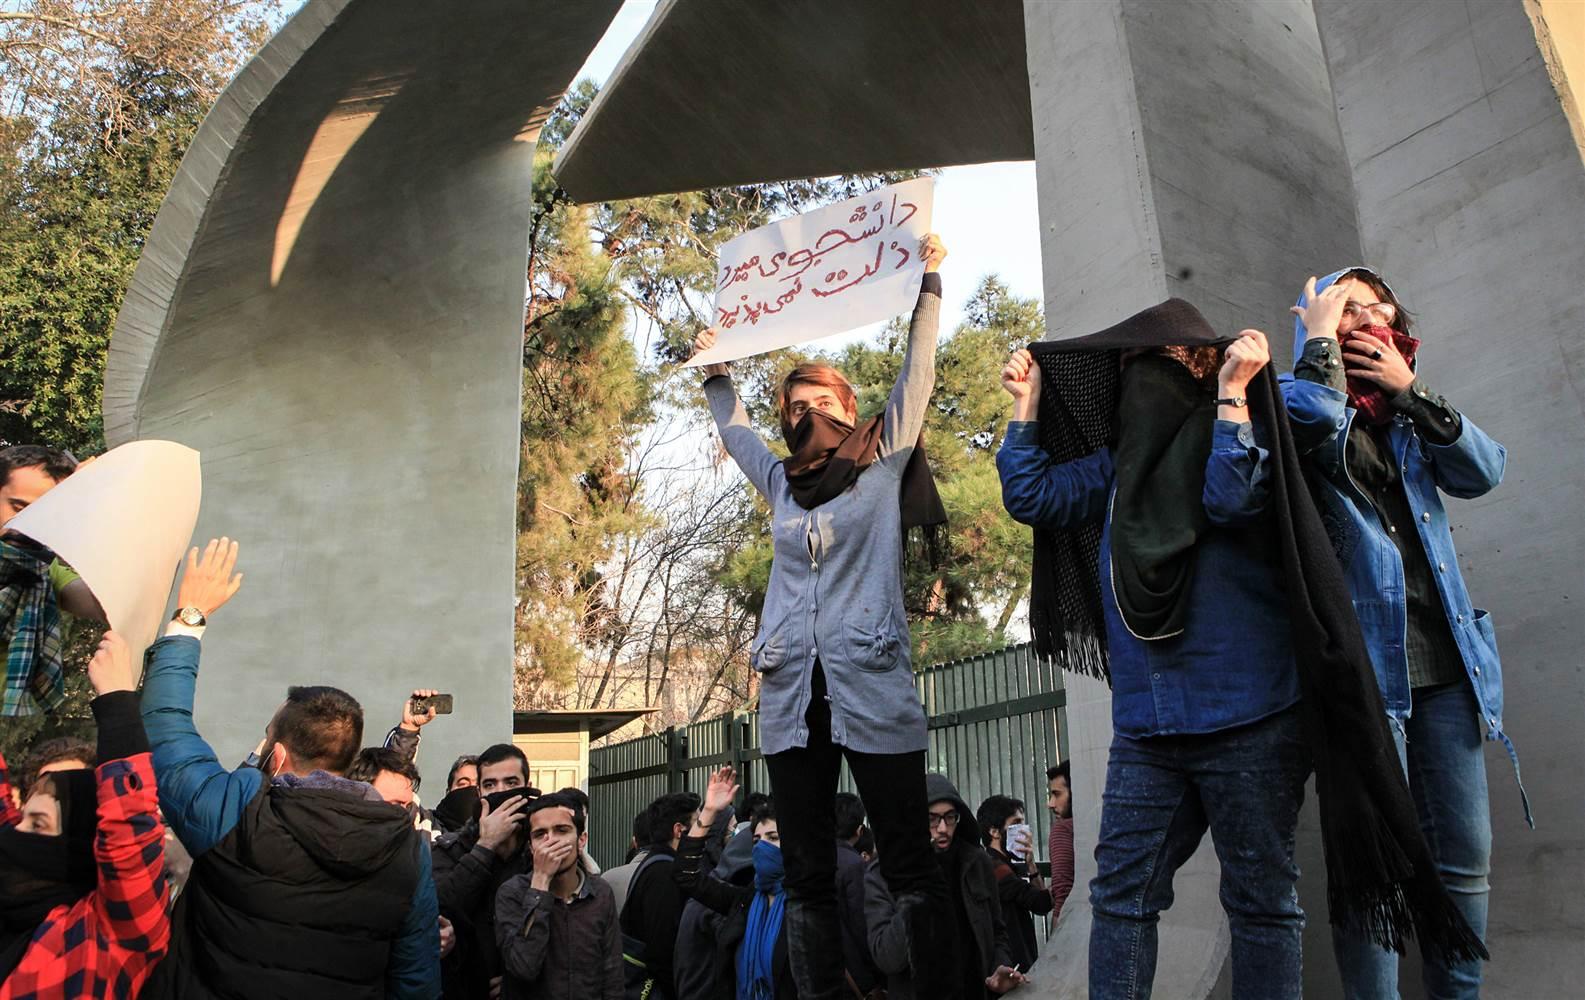 171230-iran-protest-2-ew_edd4f085896f00c